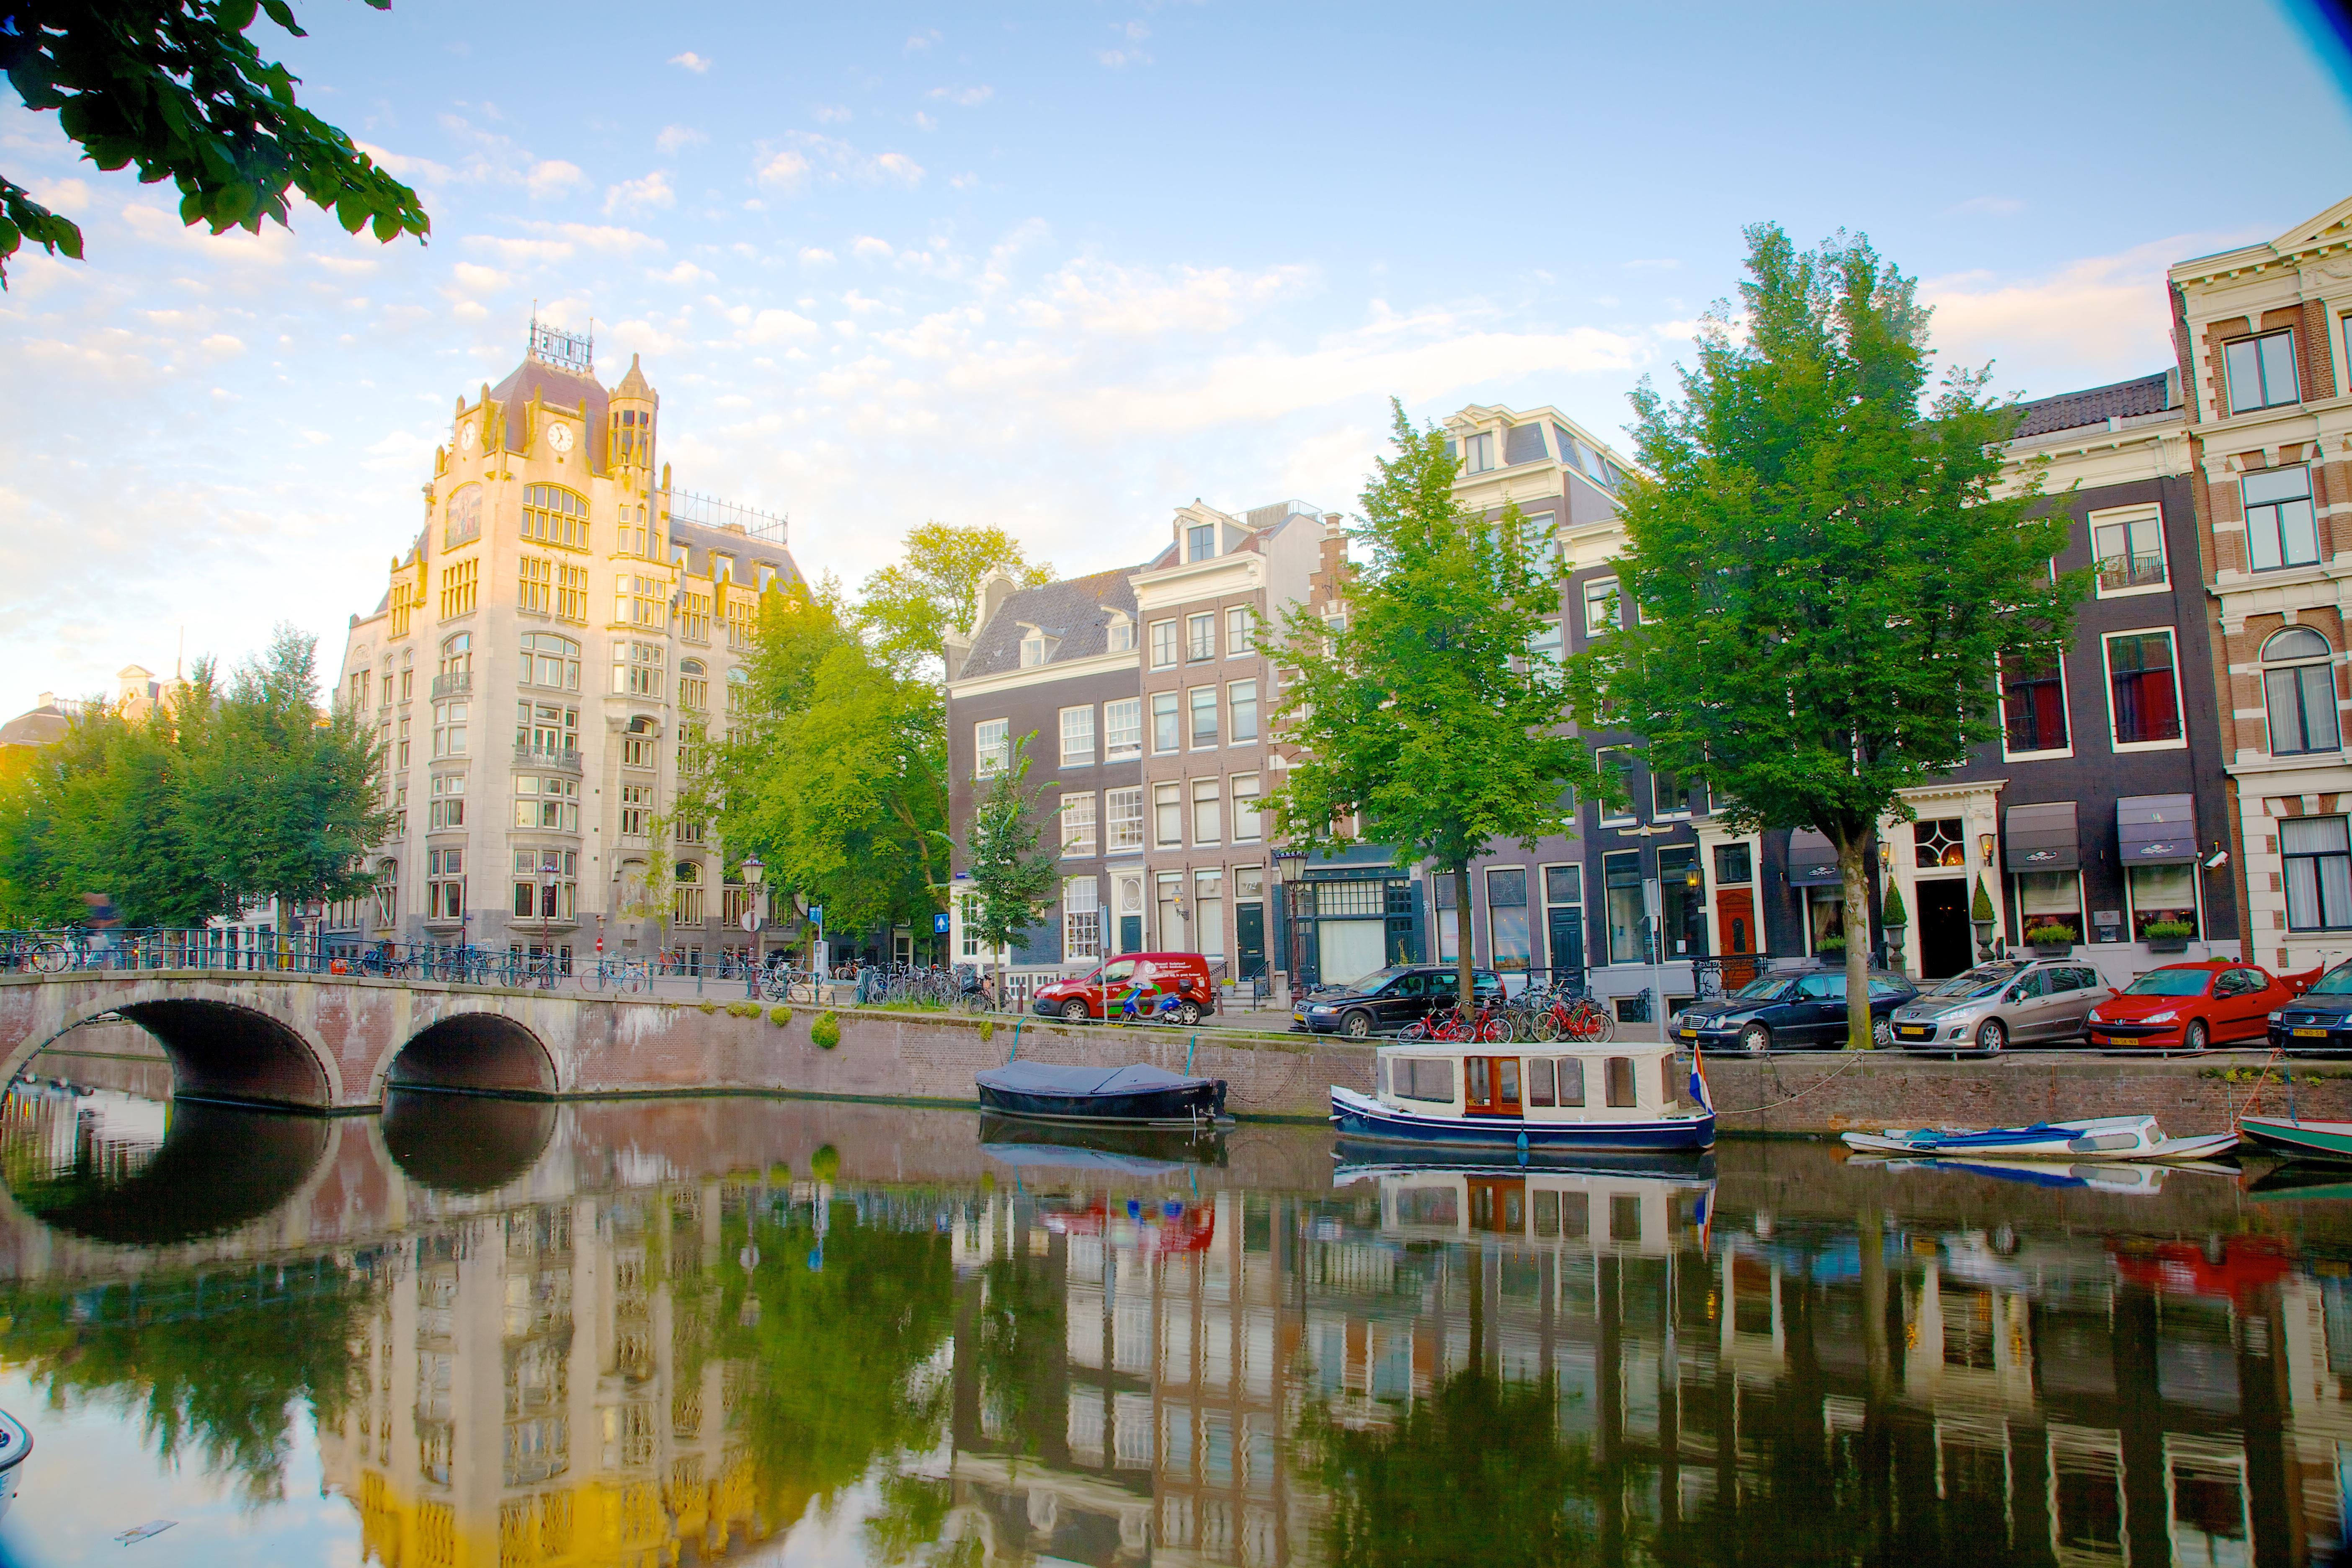 Imagebox_-2012_08_29_Amsterdam_026.jpg?1548822916